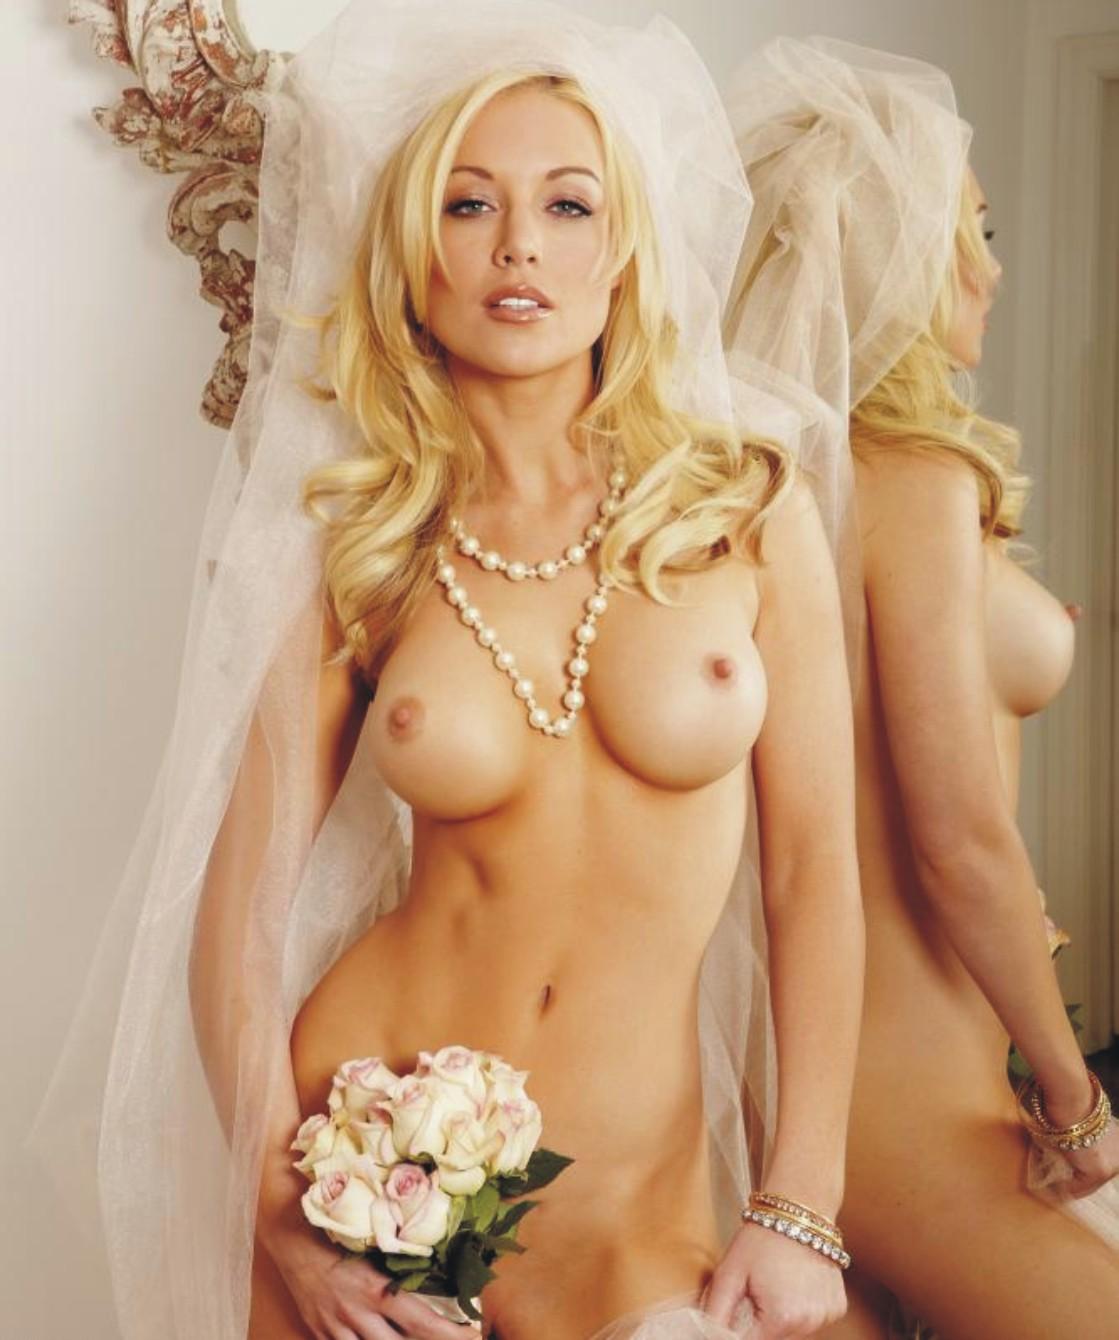 kayden cross   nude is lifestyle